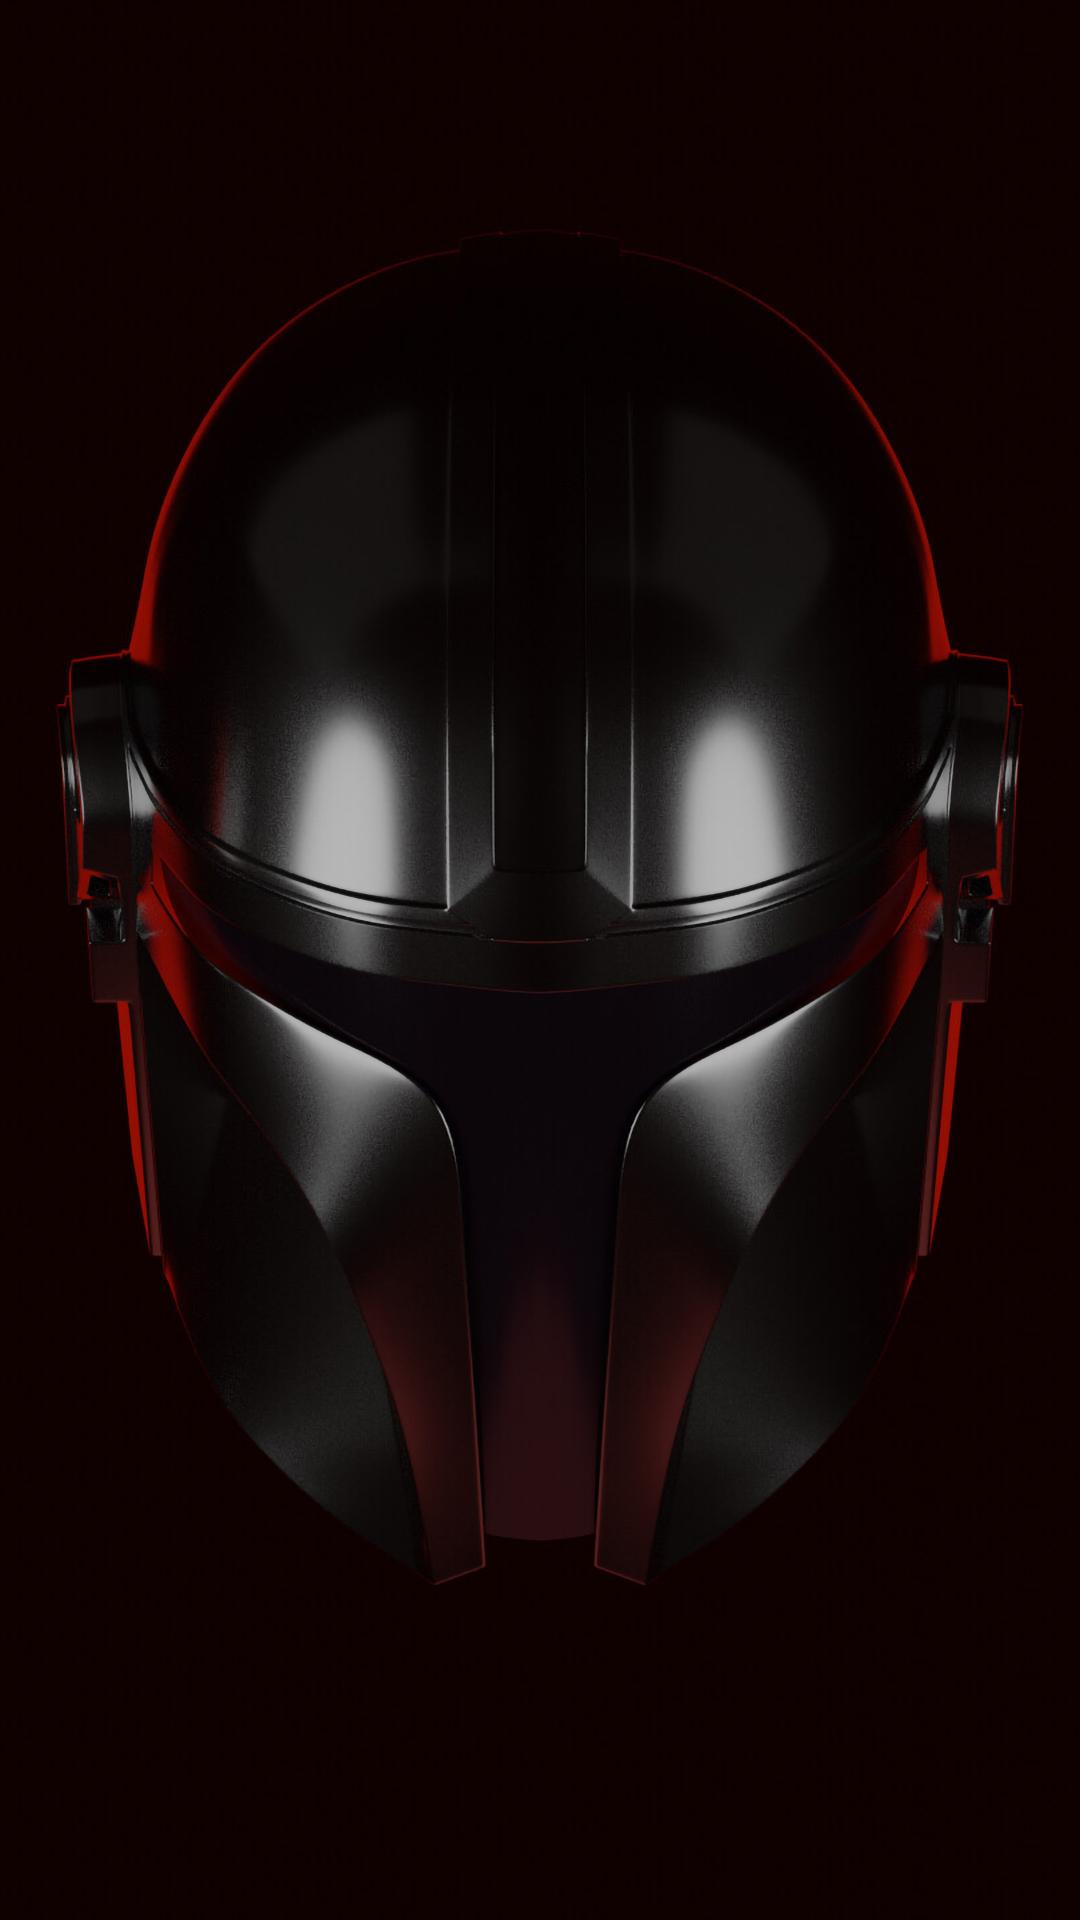 Mandalorian Helmet Wallpaper 4k